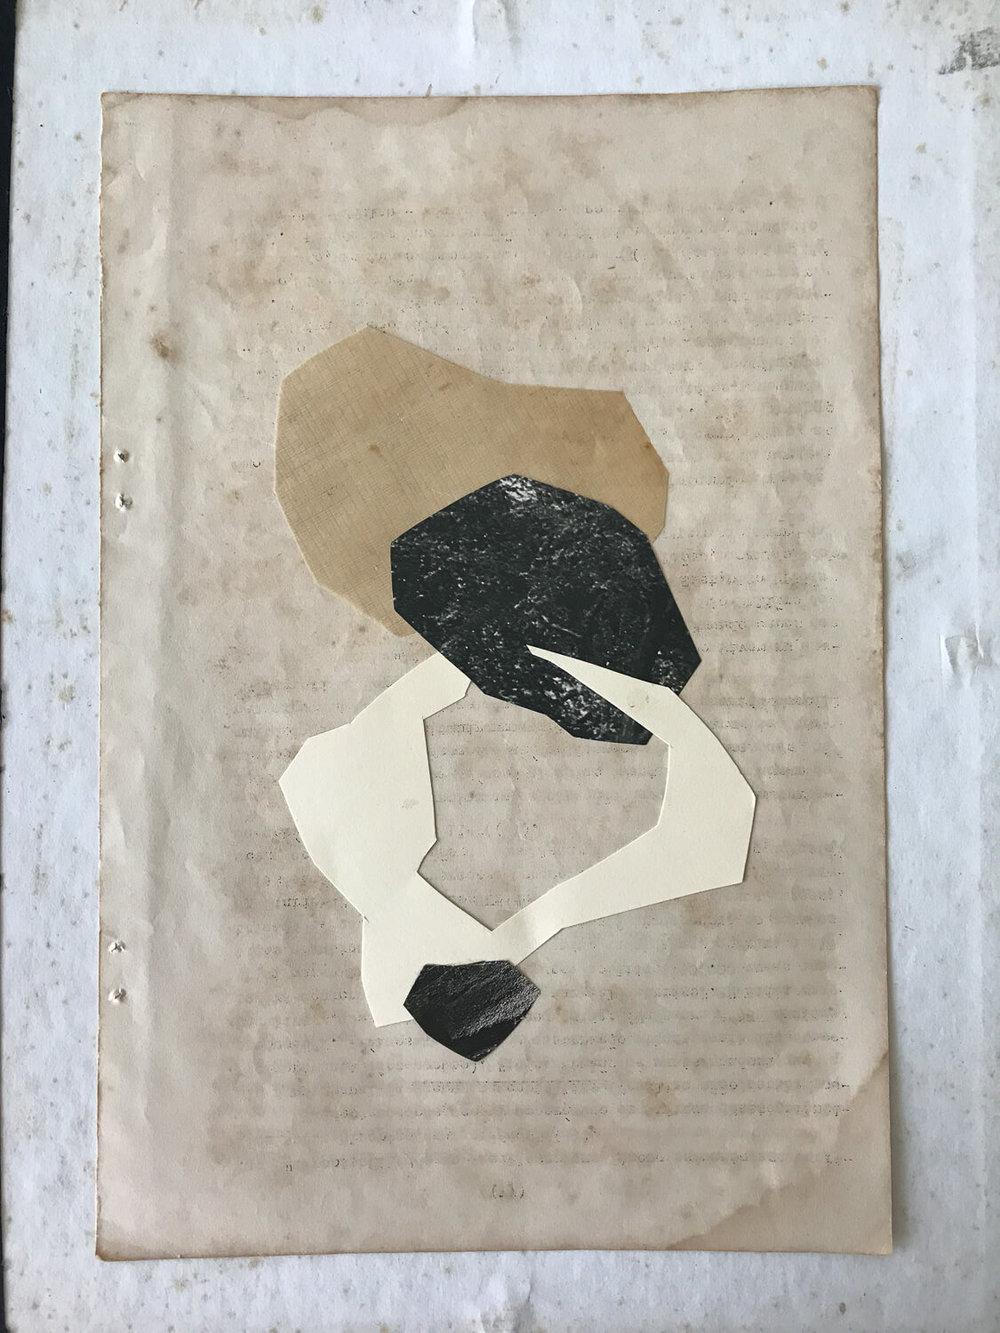 jay-paganini_20171003_untitled_06_00x00cm_paper-collage_web.jpg